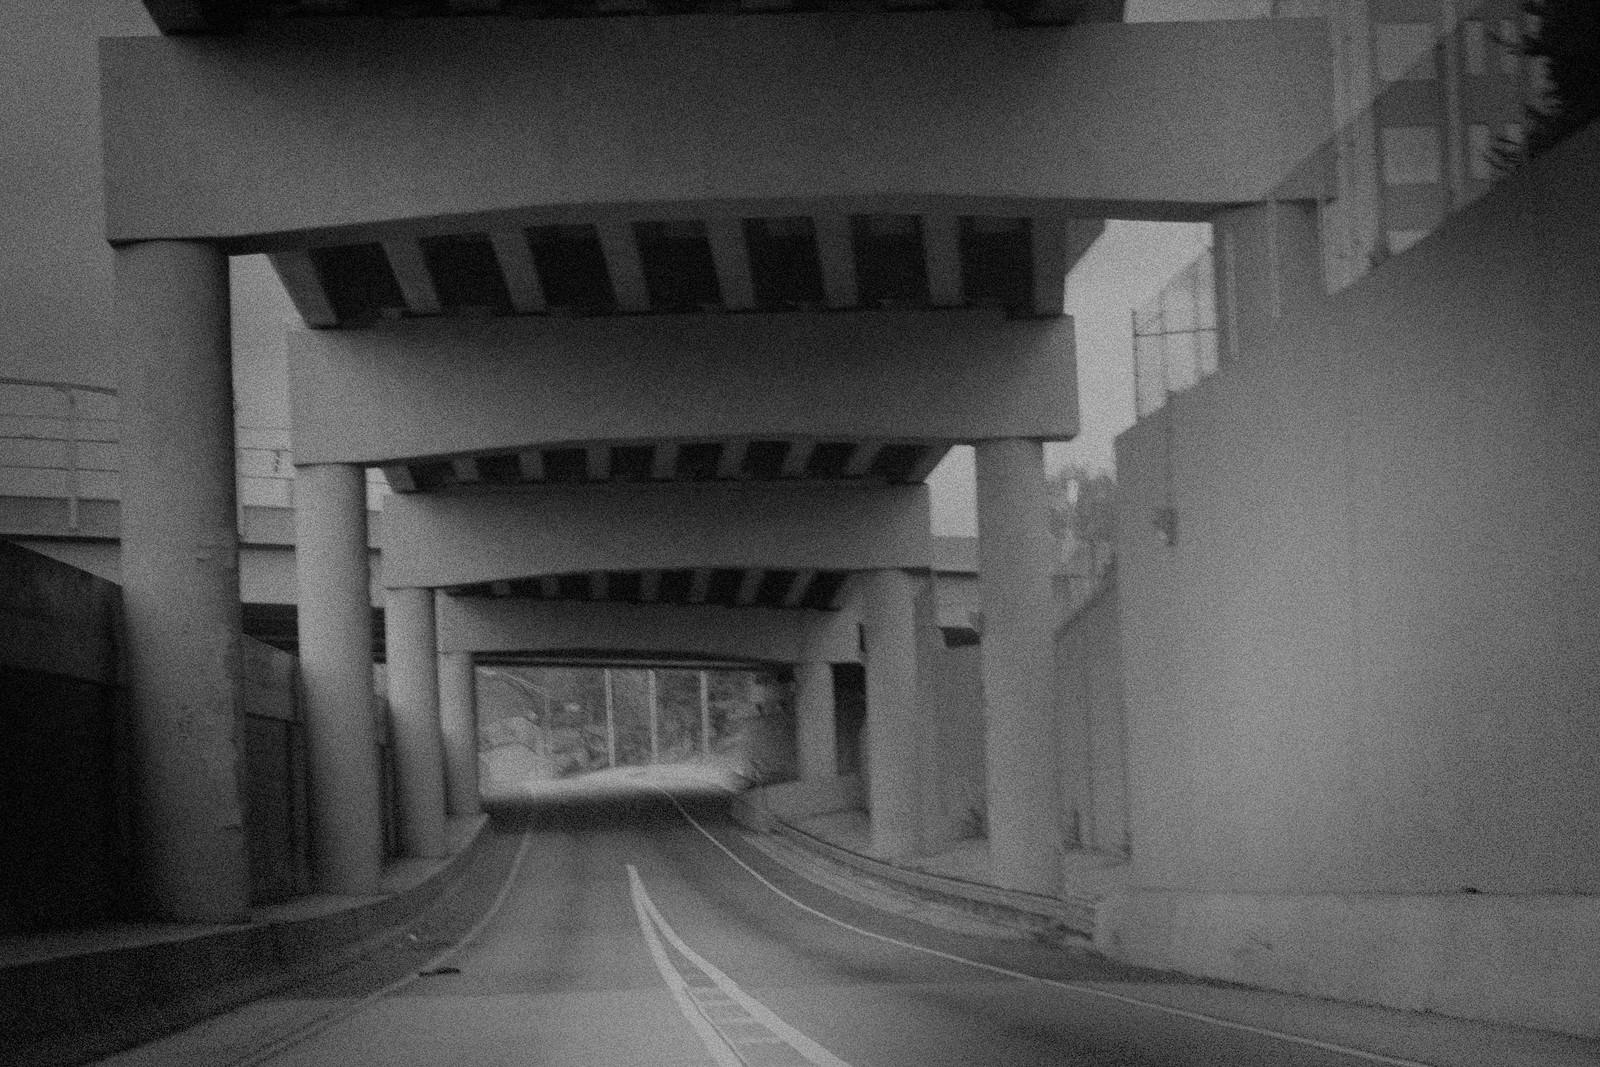 I85 and 14th Street, Midtown Atlanta, Nov 2014